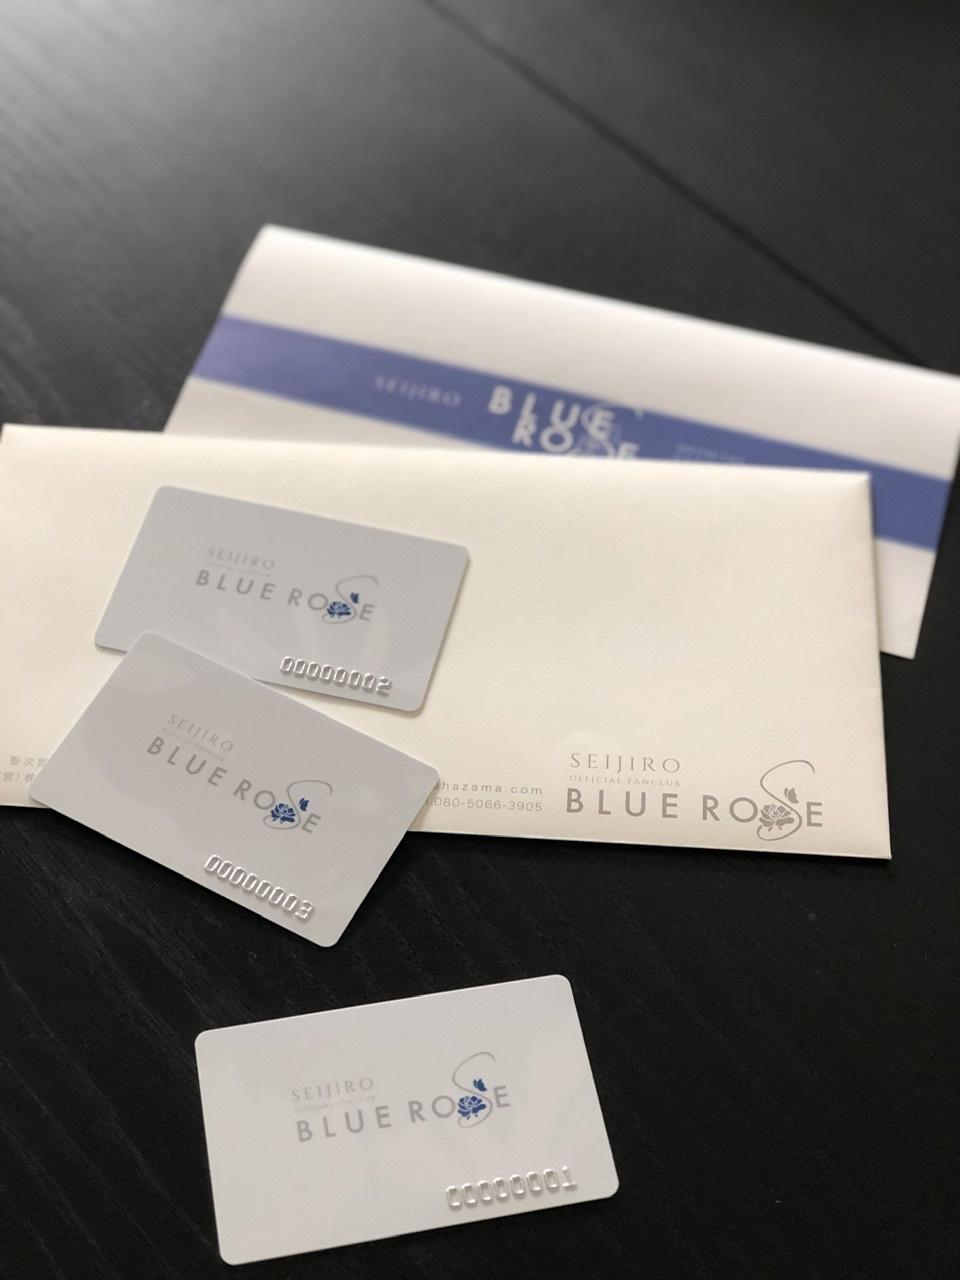 「YOU&優」「BLUE ROSE」オフィシャルファンクラブ会員証完成しました!_a0157409_14012012.jpeg